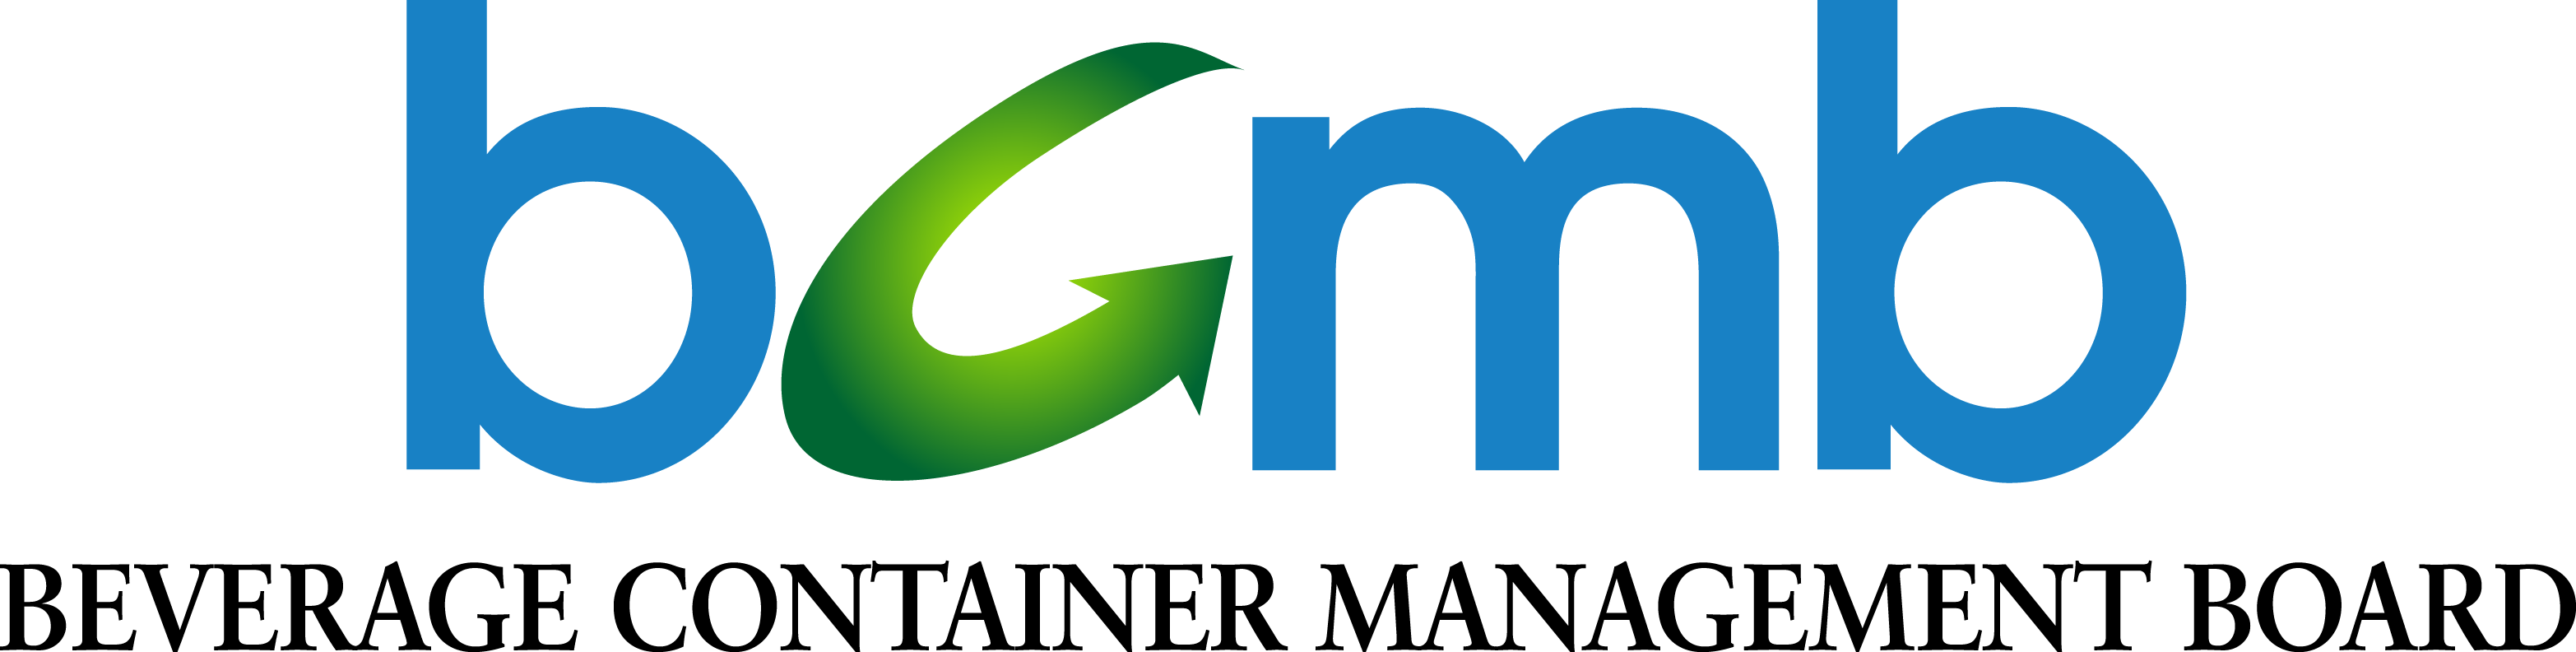 bcmb_logo2009-colour